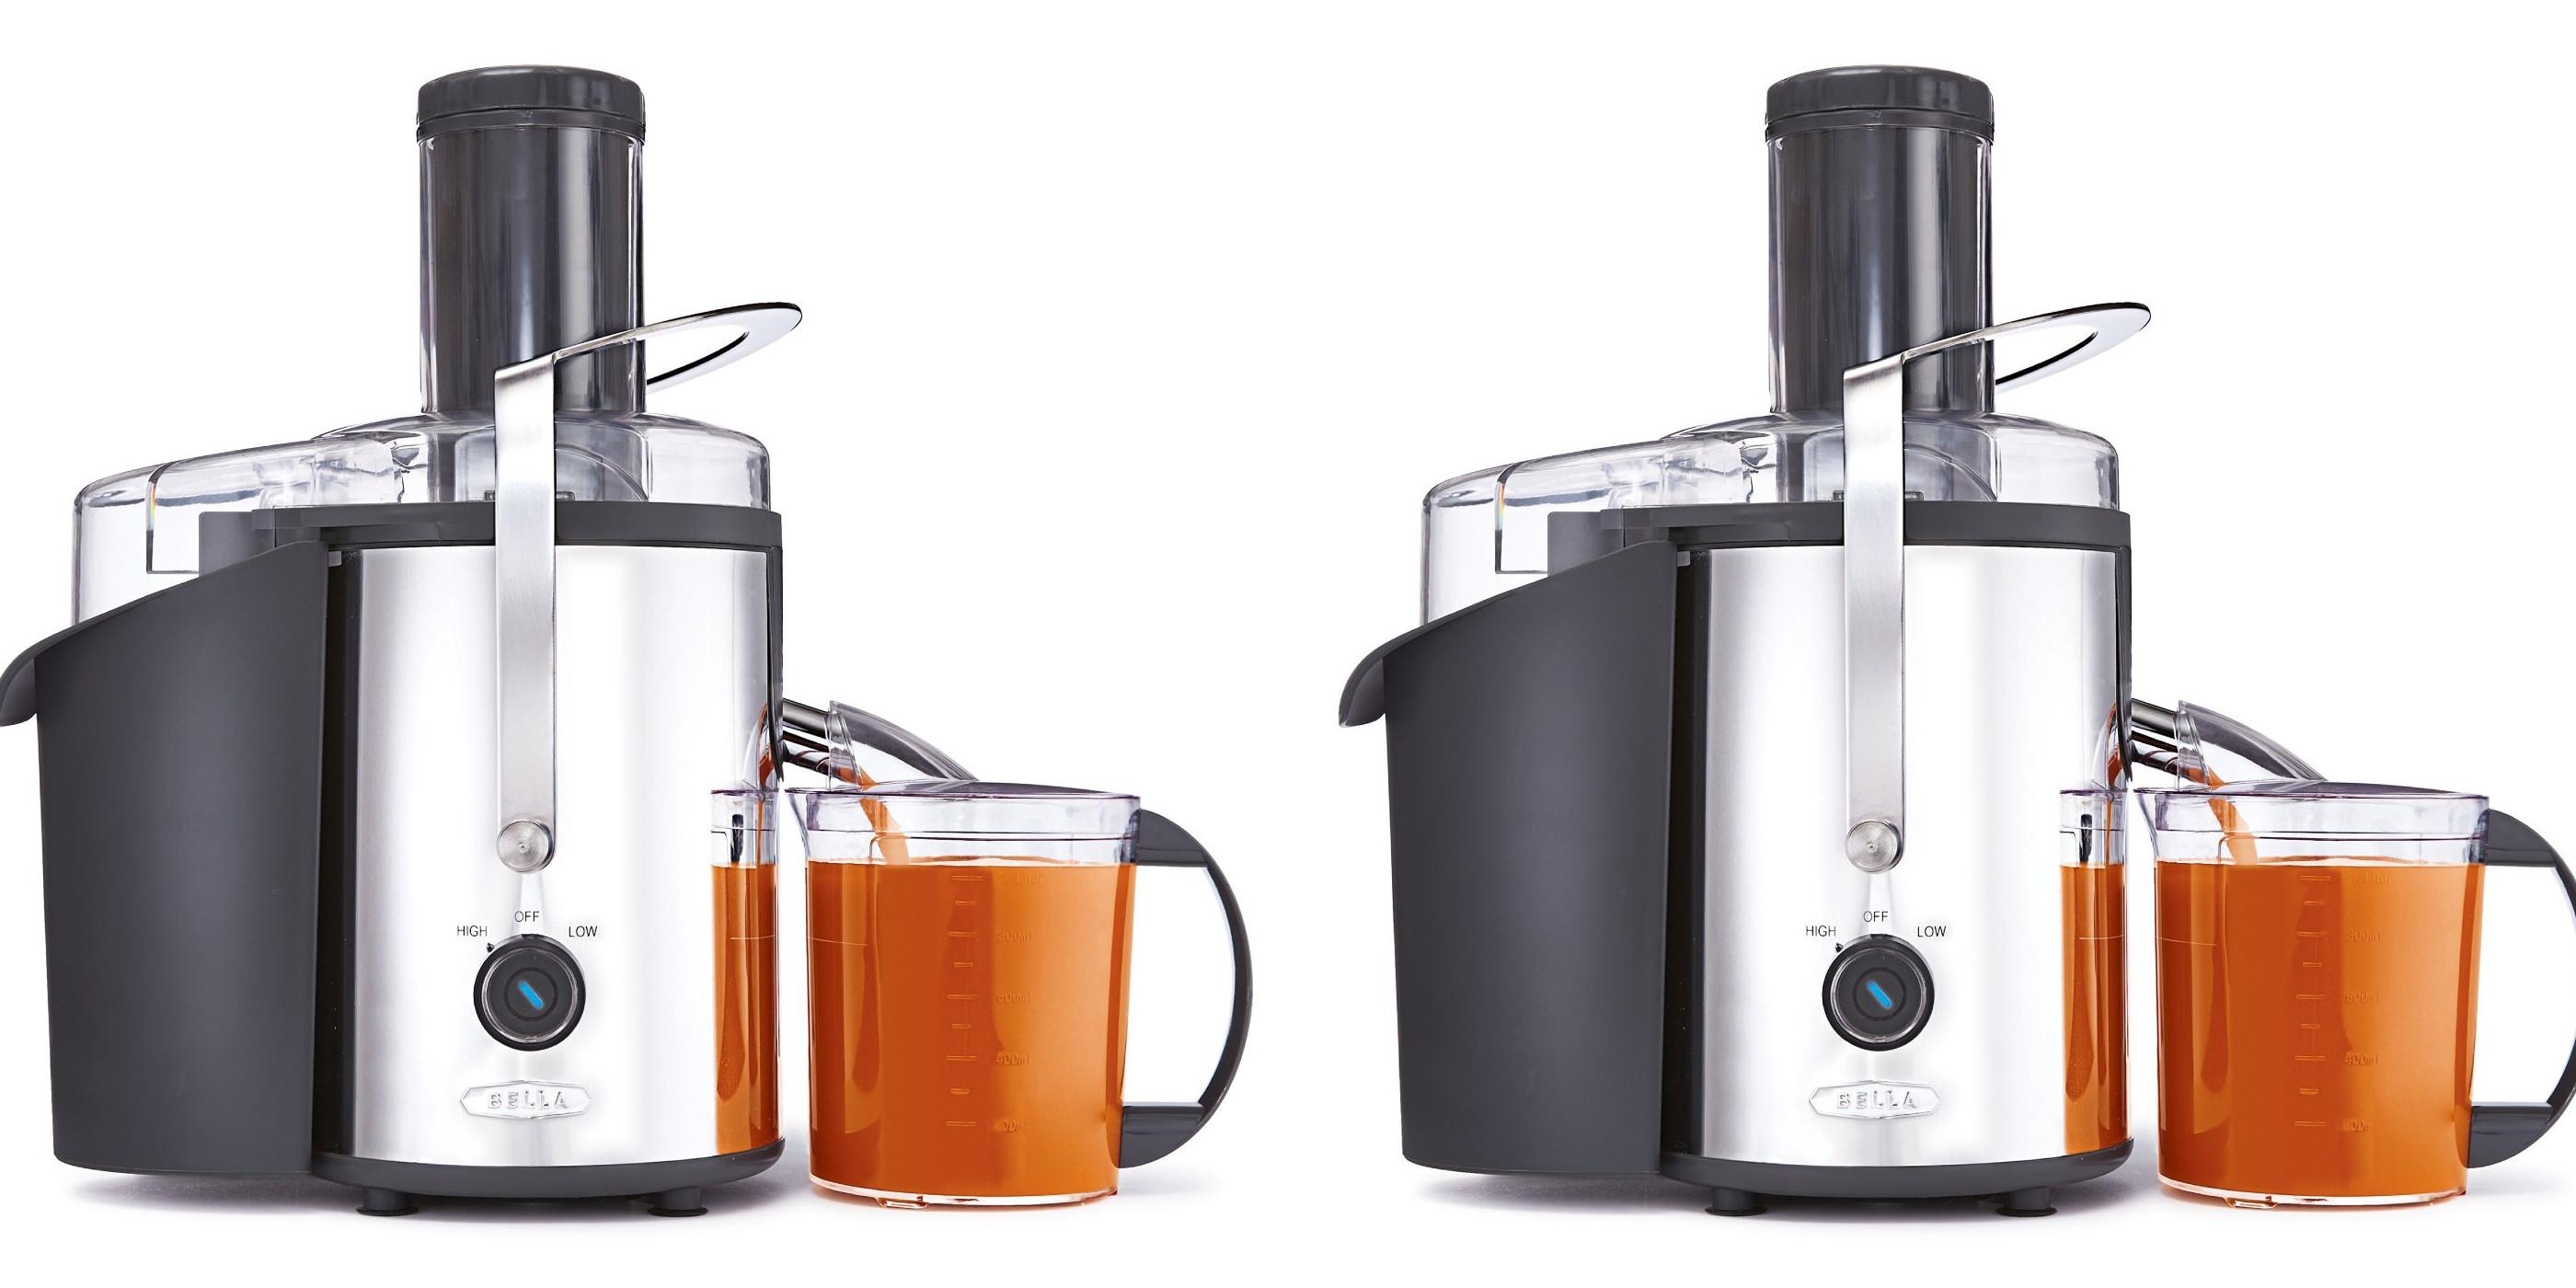 stainless-steel-bella-high-power-juice-extractor-4